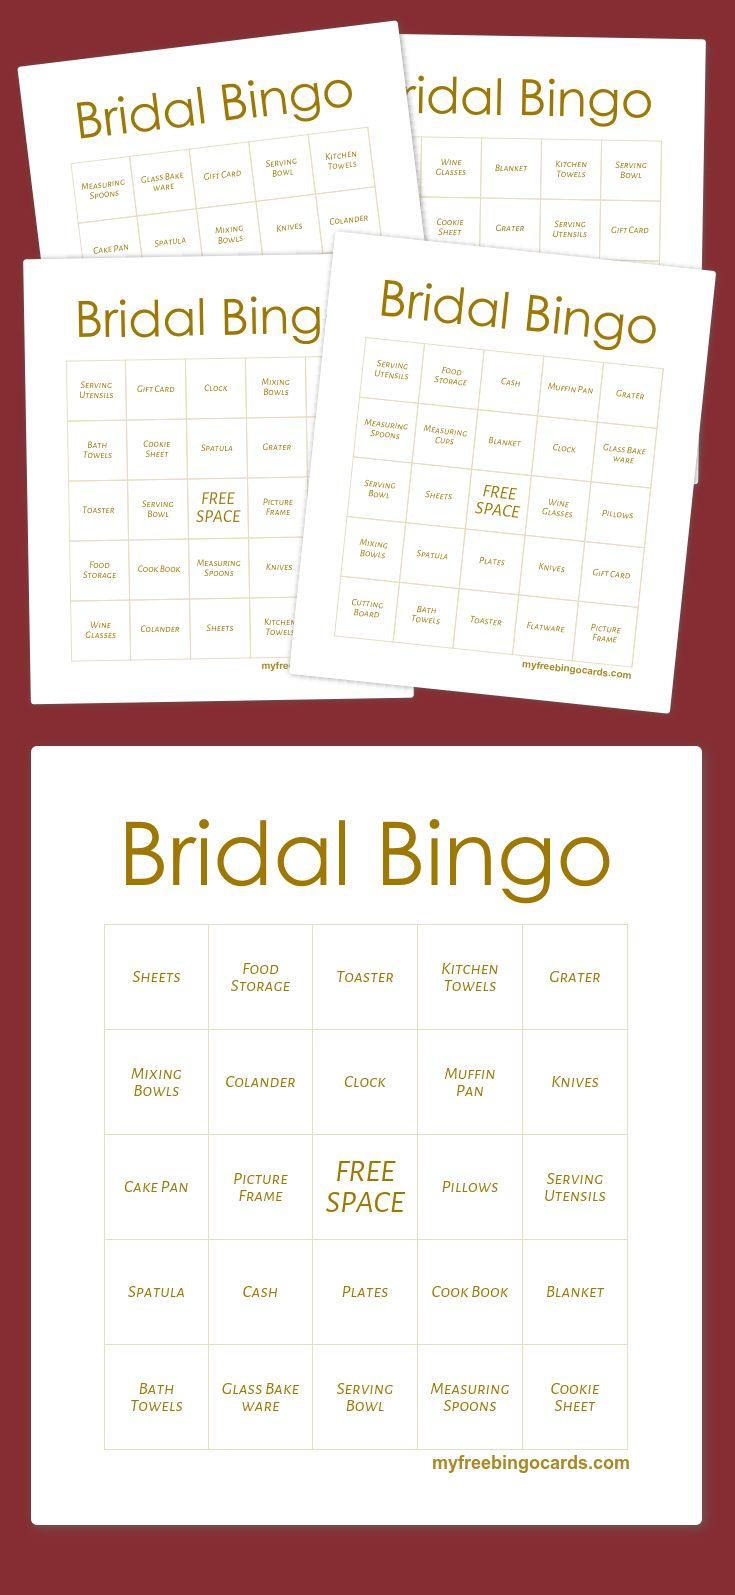 Bridal Bingo · Bingo Card GeneratorBridal BingoClassroom GamesFree Printable Bingo CardsGeneratorsMake Your OwnBridal Showers